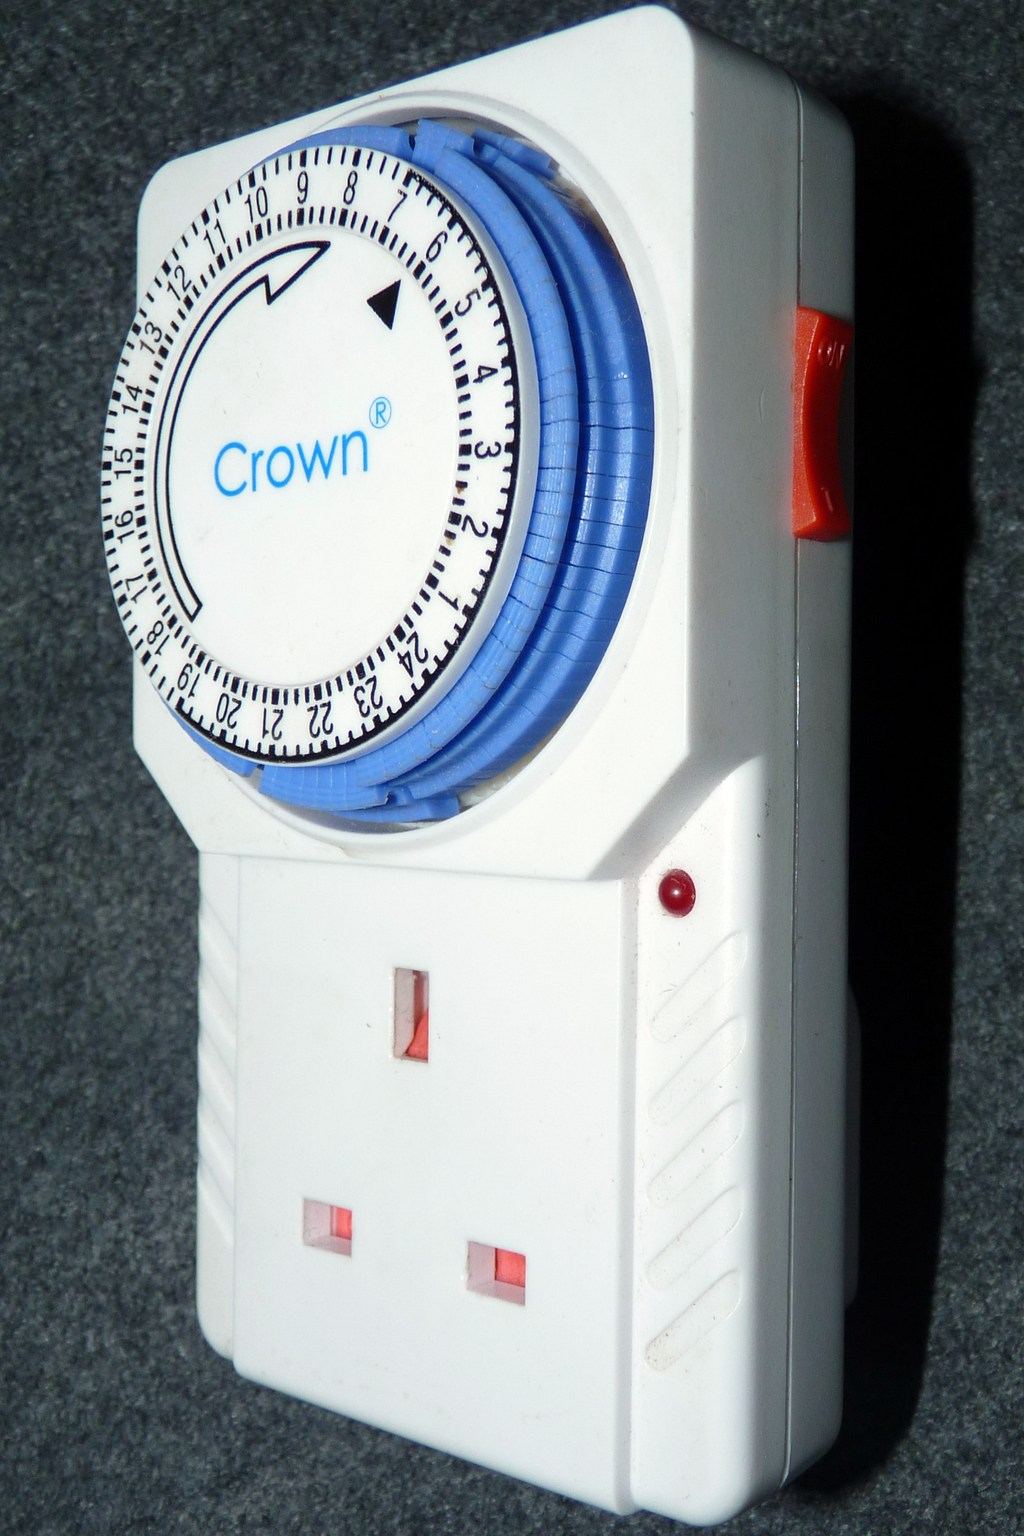 set up an IP camera timer switch